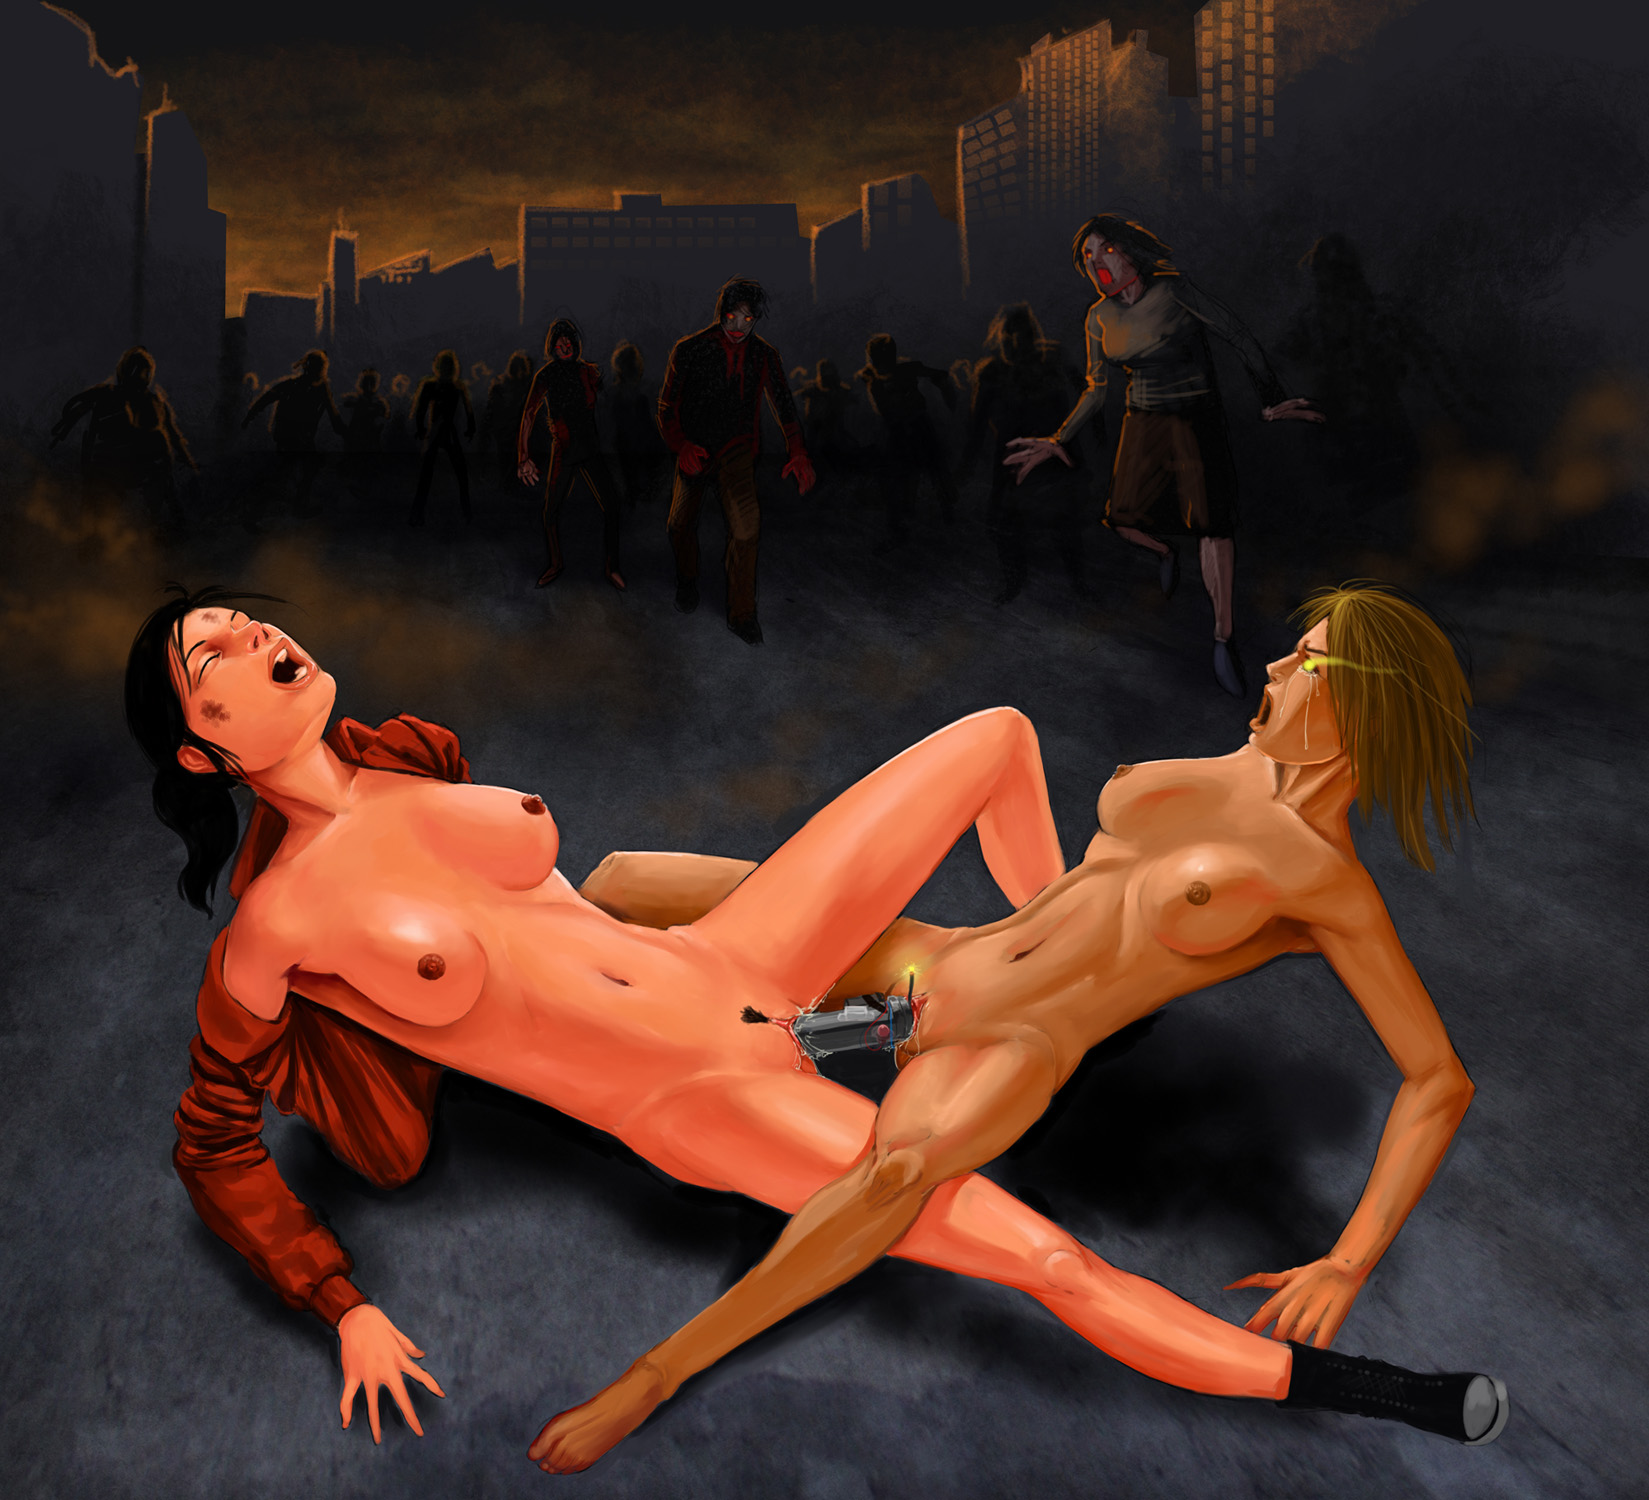 3d sexvilla alyx vance hentai pictures